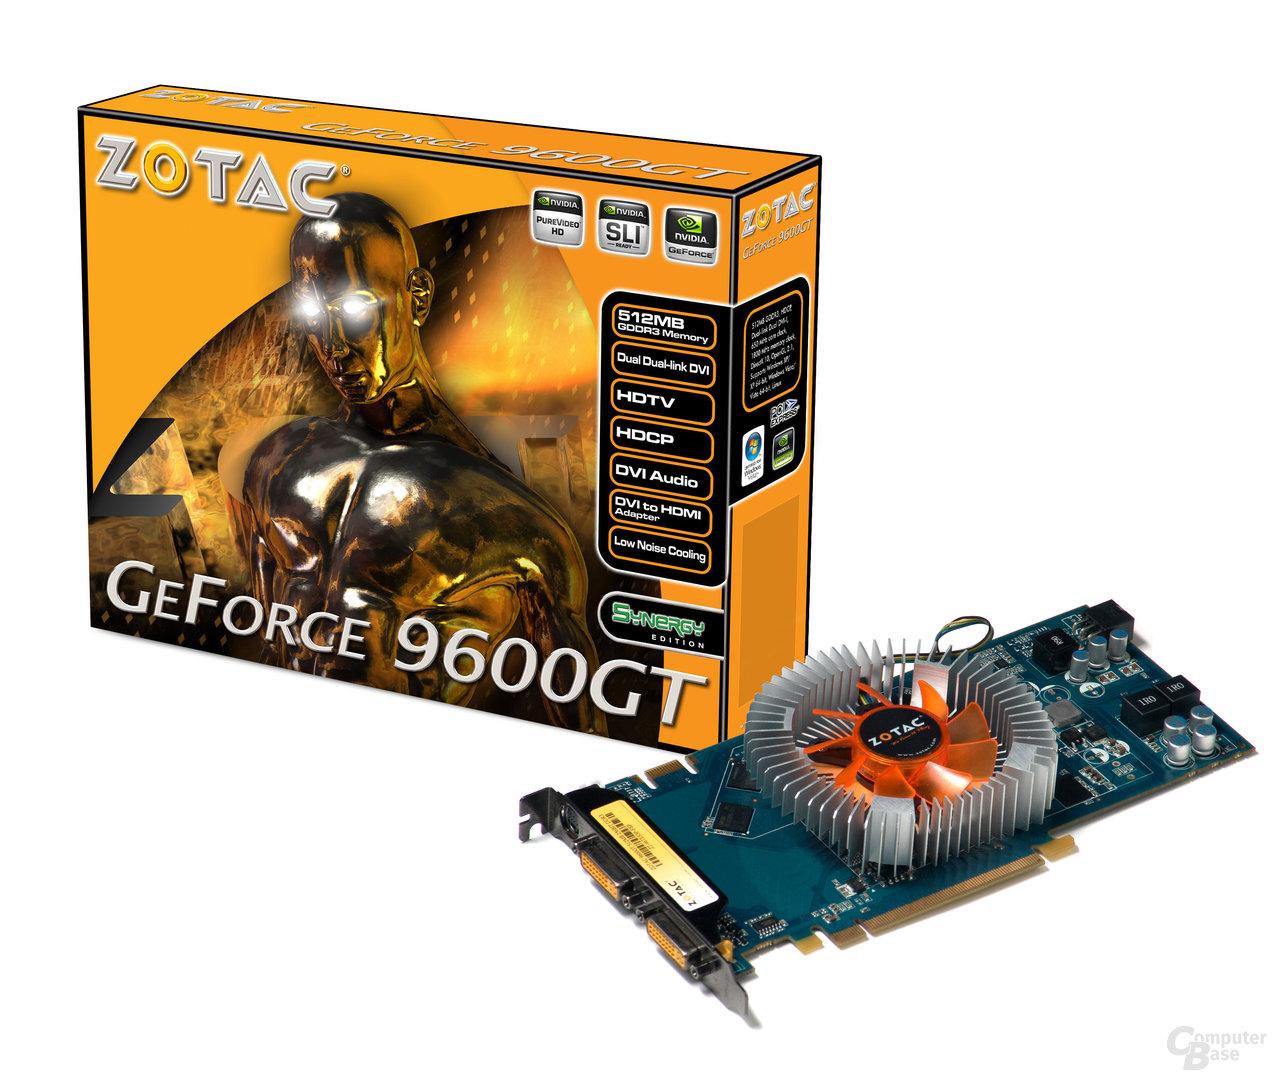 Zotac GeForce Synergy 9600 GT